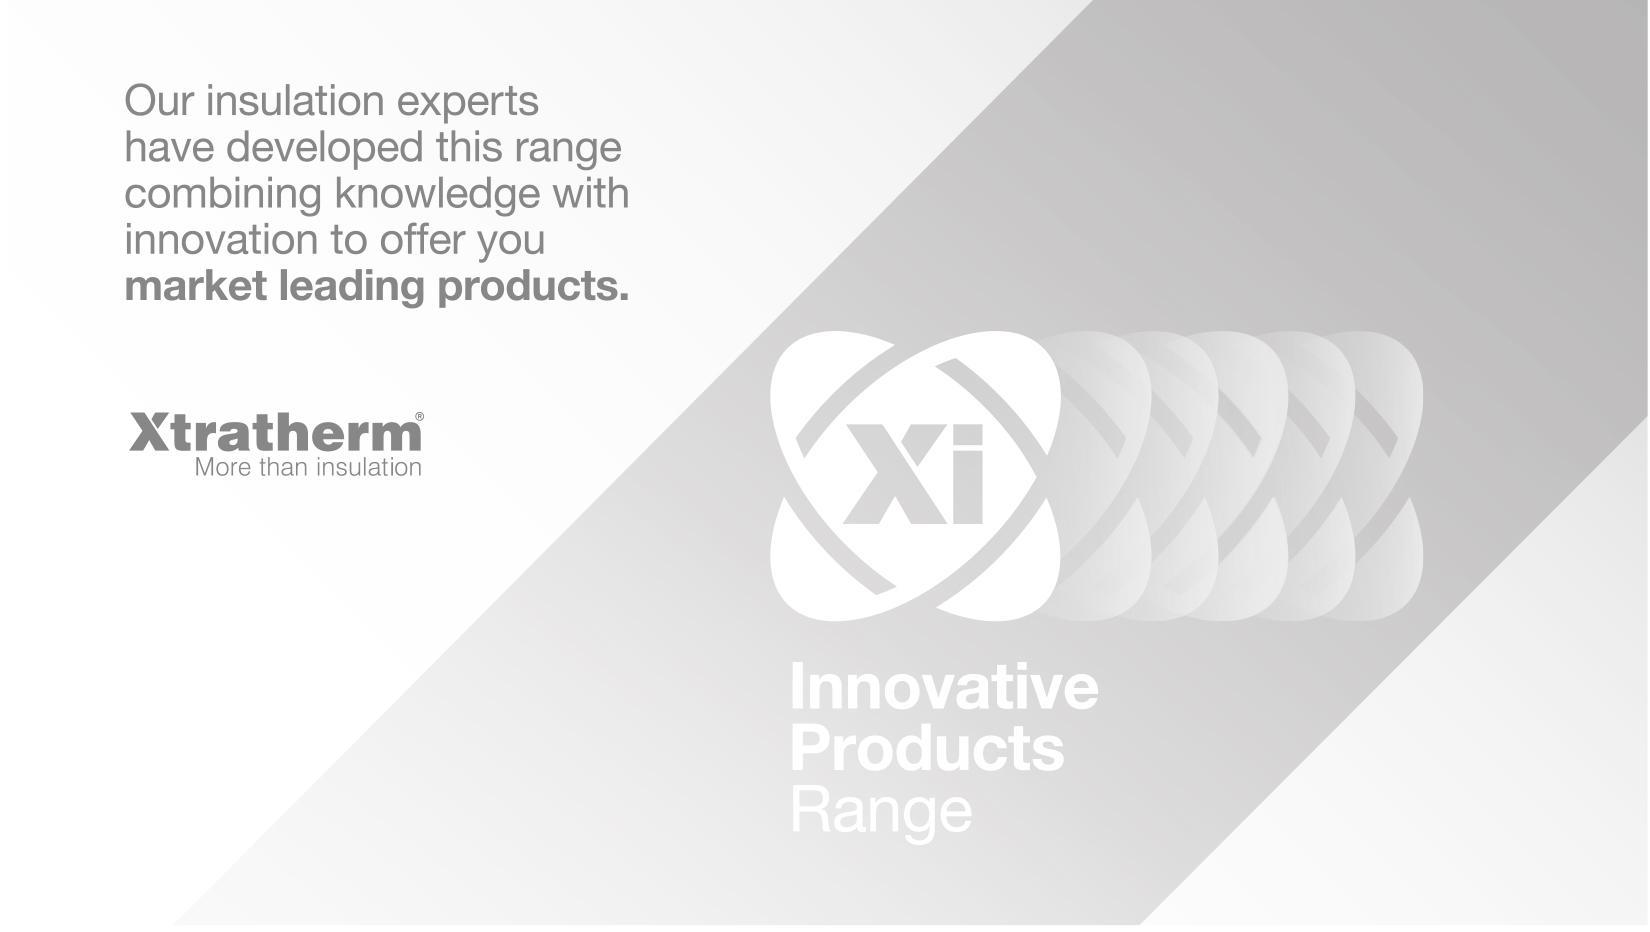 Xtratherm XI Innovation